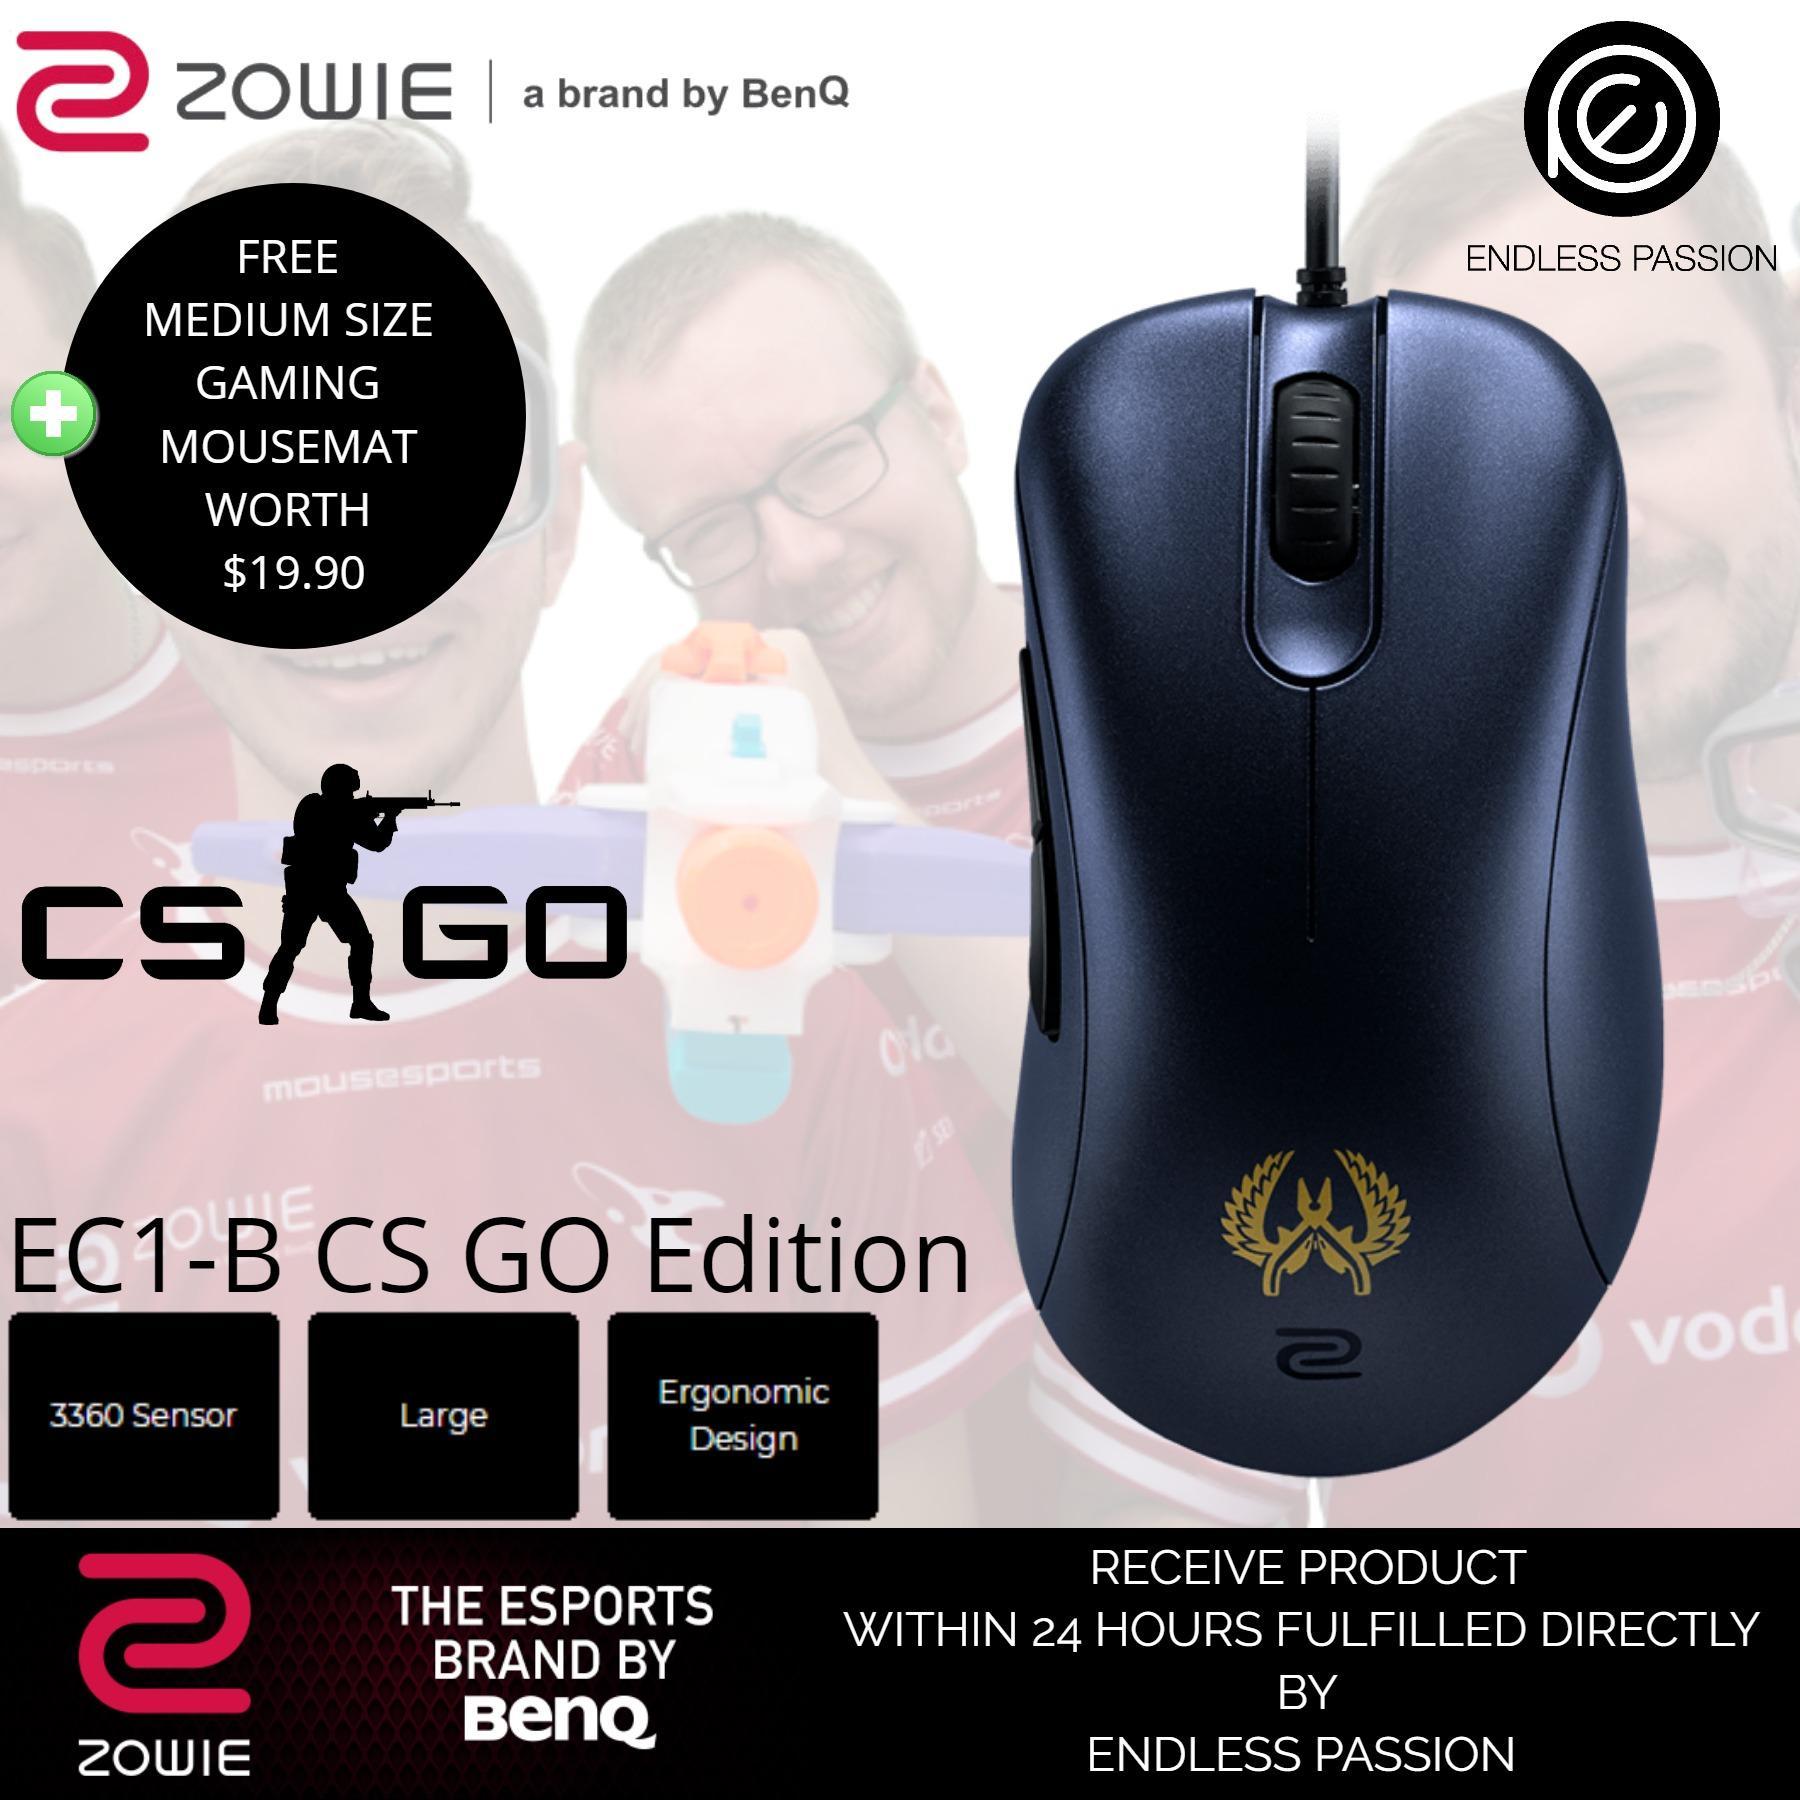 Where To Shop For Benq Zowie Ec1 B Cs Go Version 3360 Sensor Esports Gaming Mouse